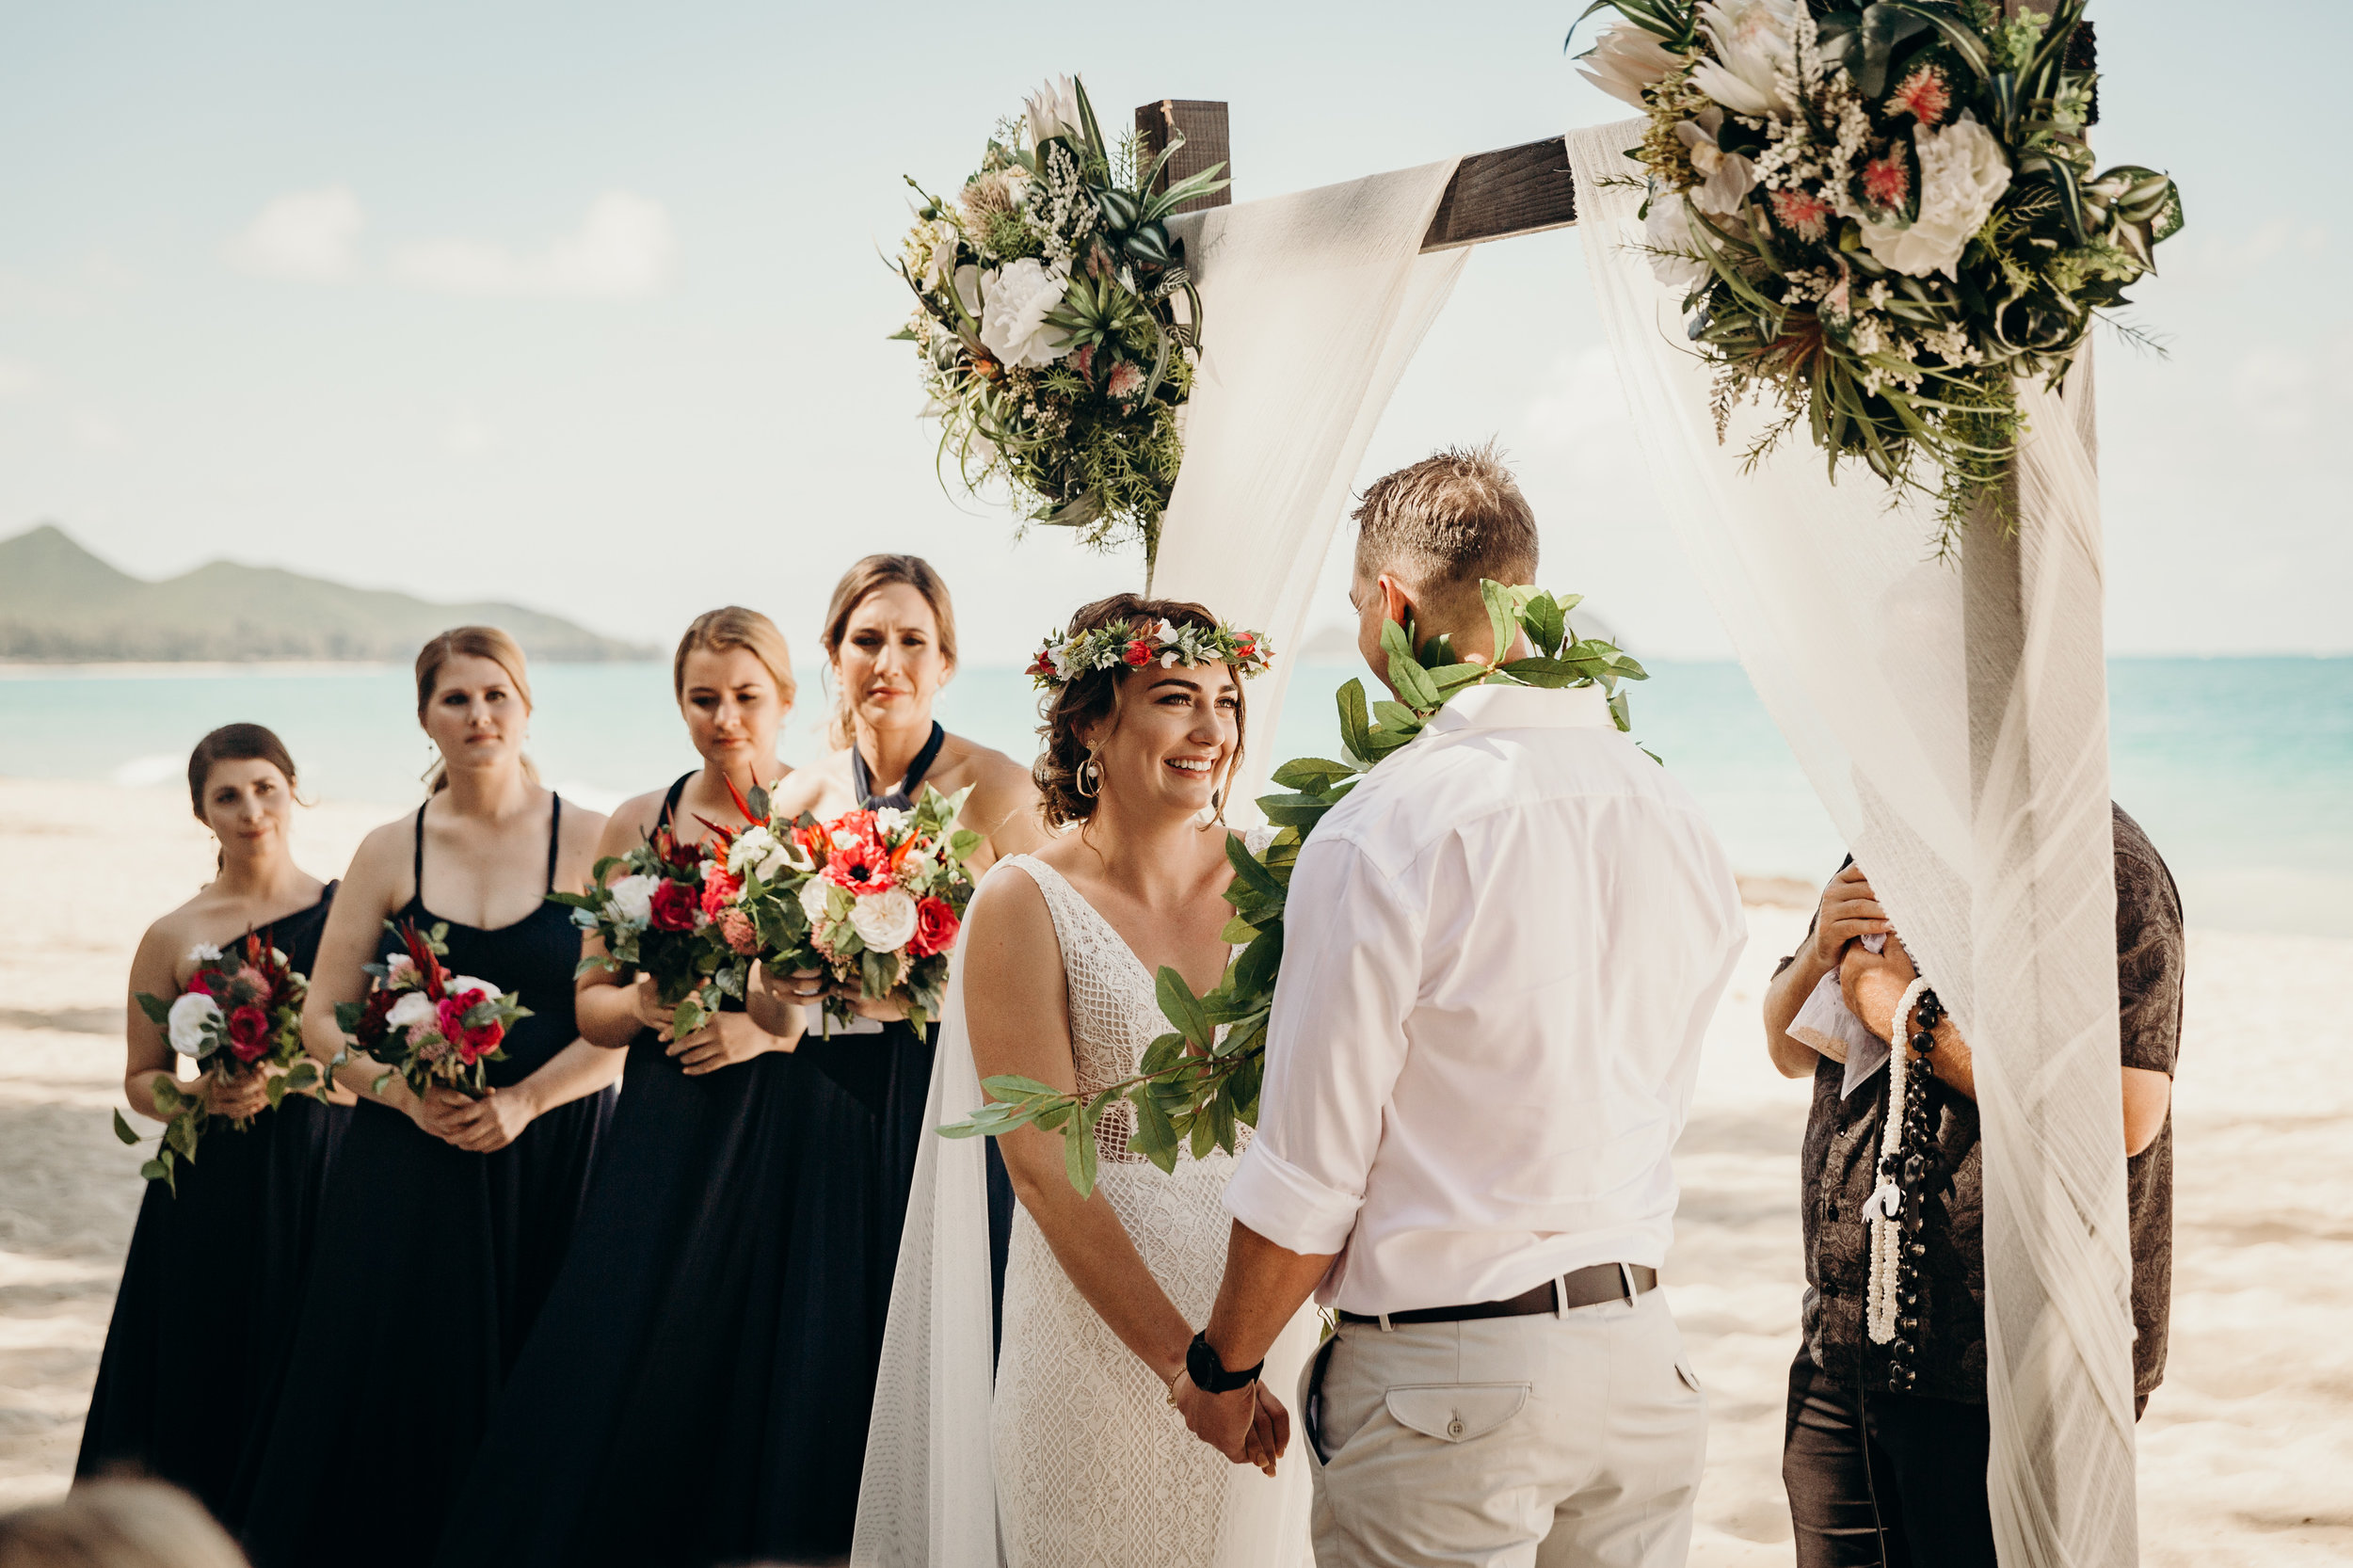 HAWAII-WEDDING-PHOTOGRAPHER-ALOHILANI-RESORT-KEANI-BAKULA-39.jpg